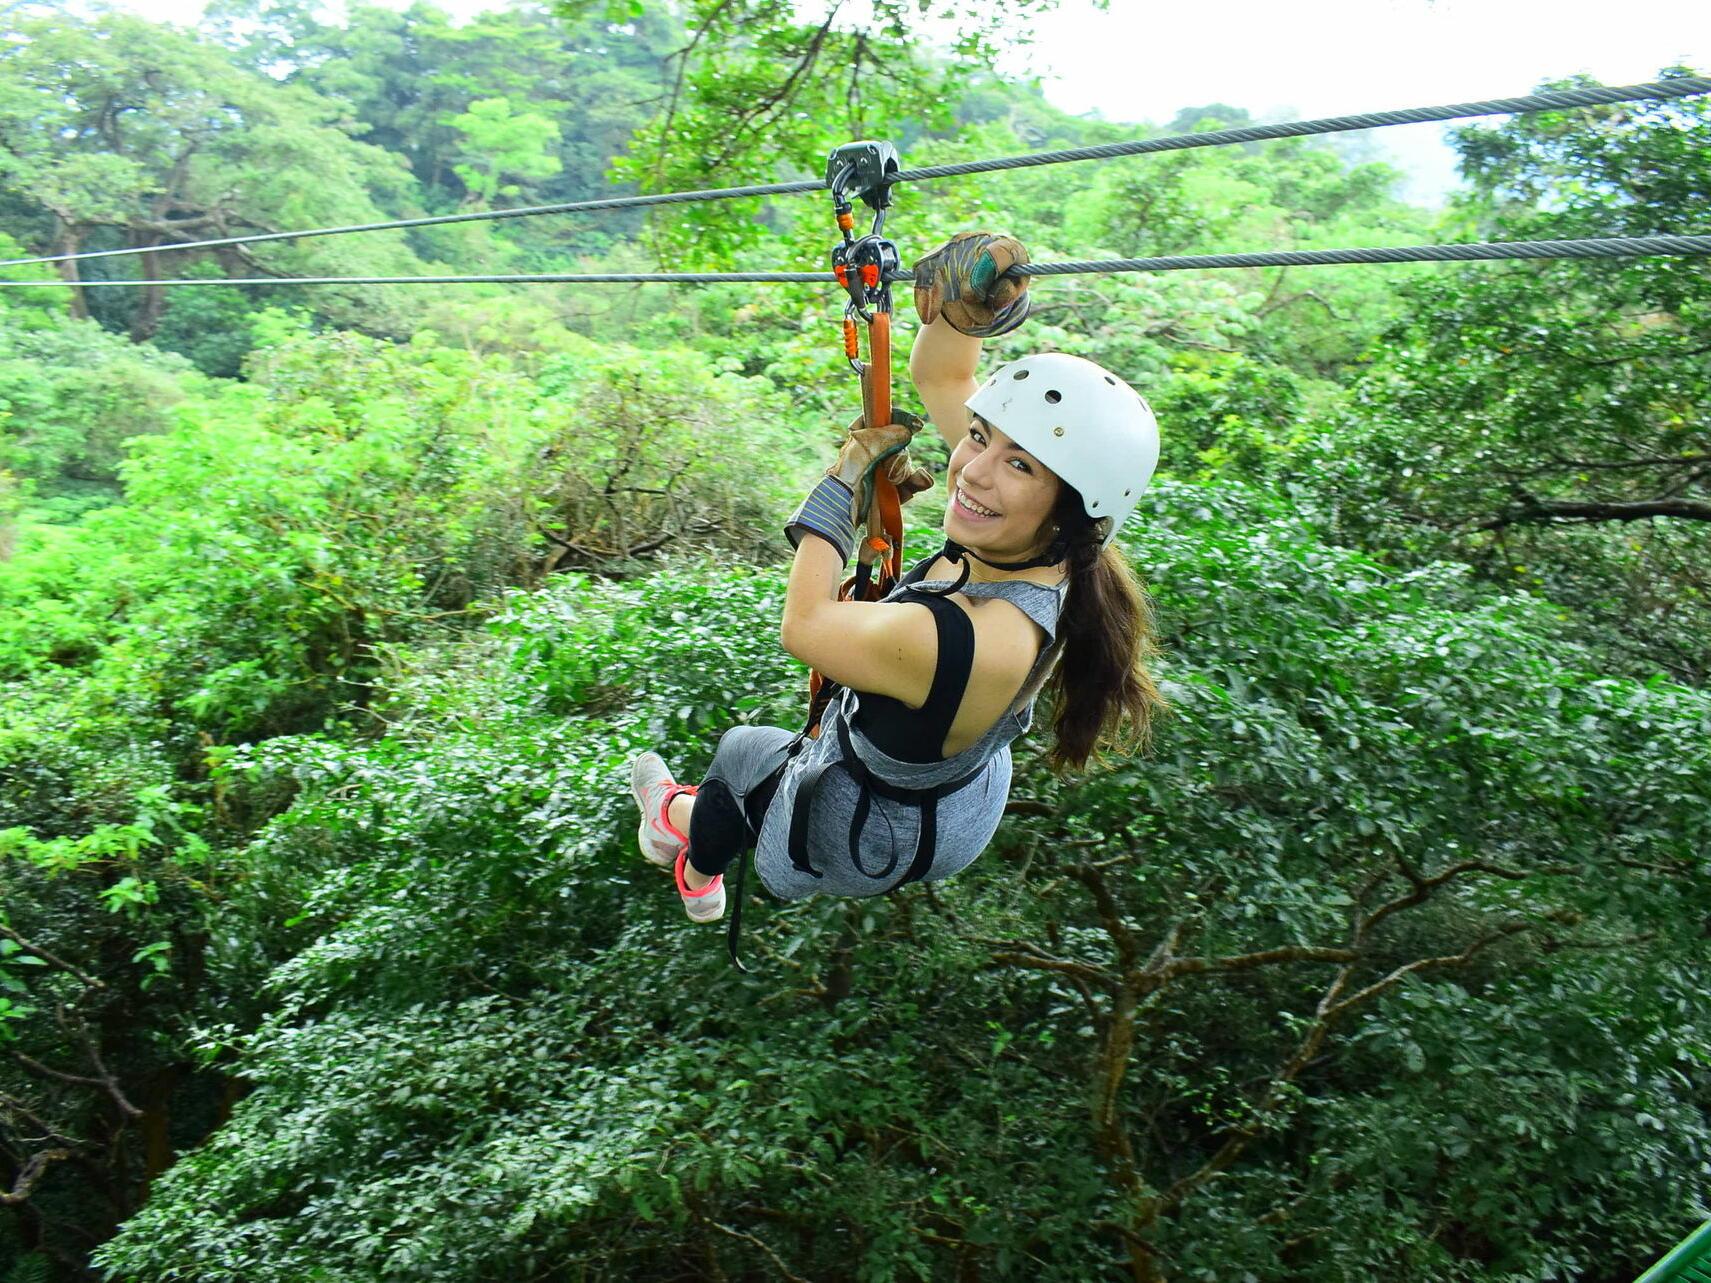 Woman Smiling and Ziplining at Buena Vista Del Rincon